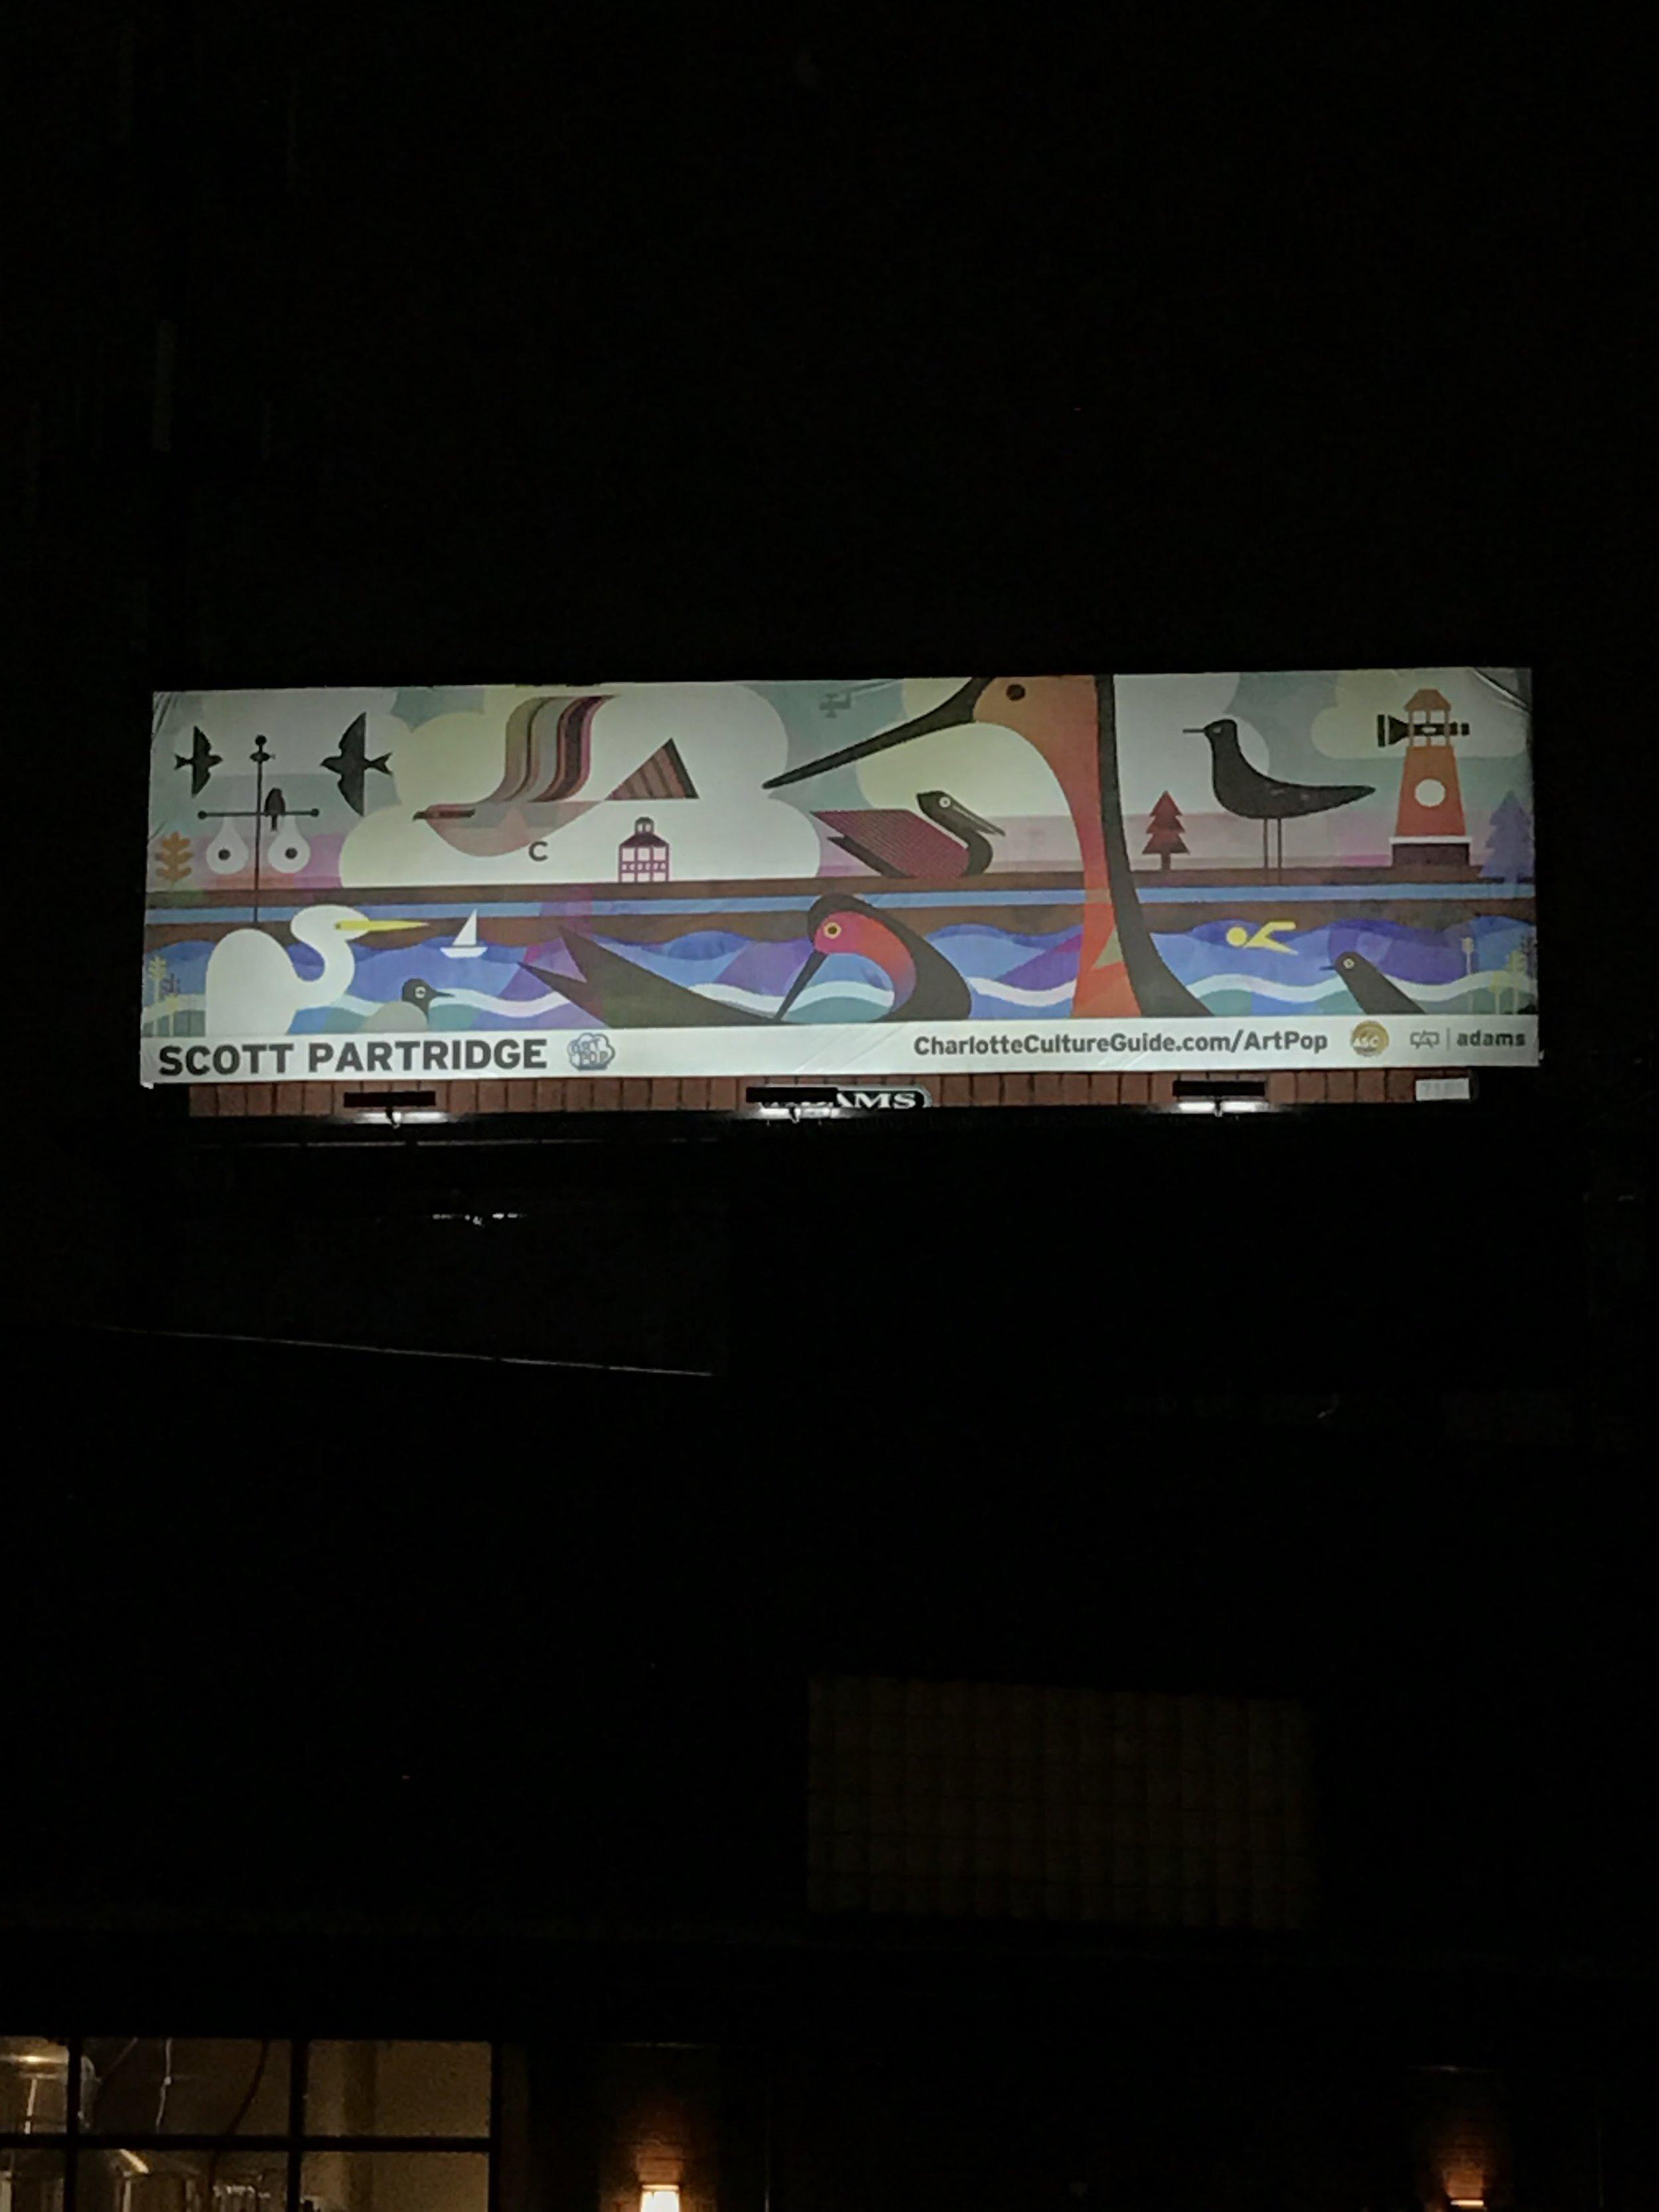 And on a billboard, sans pugs